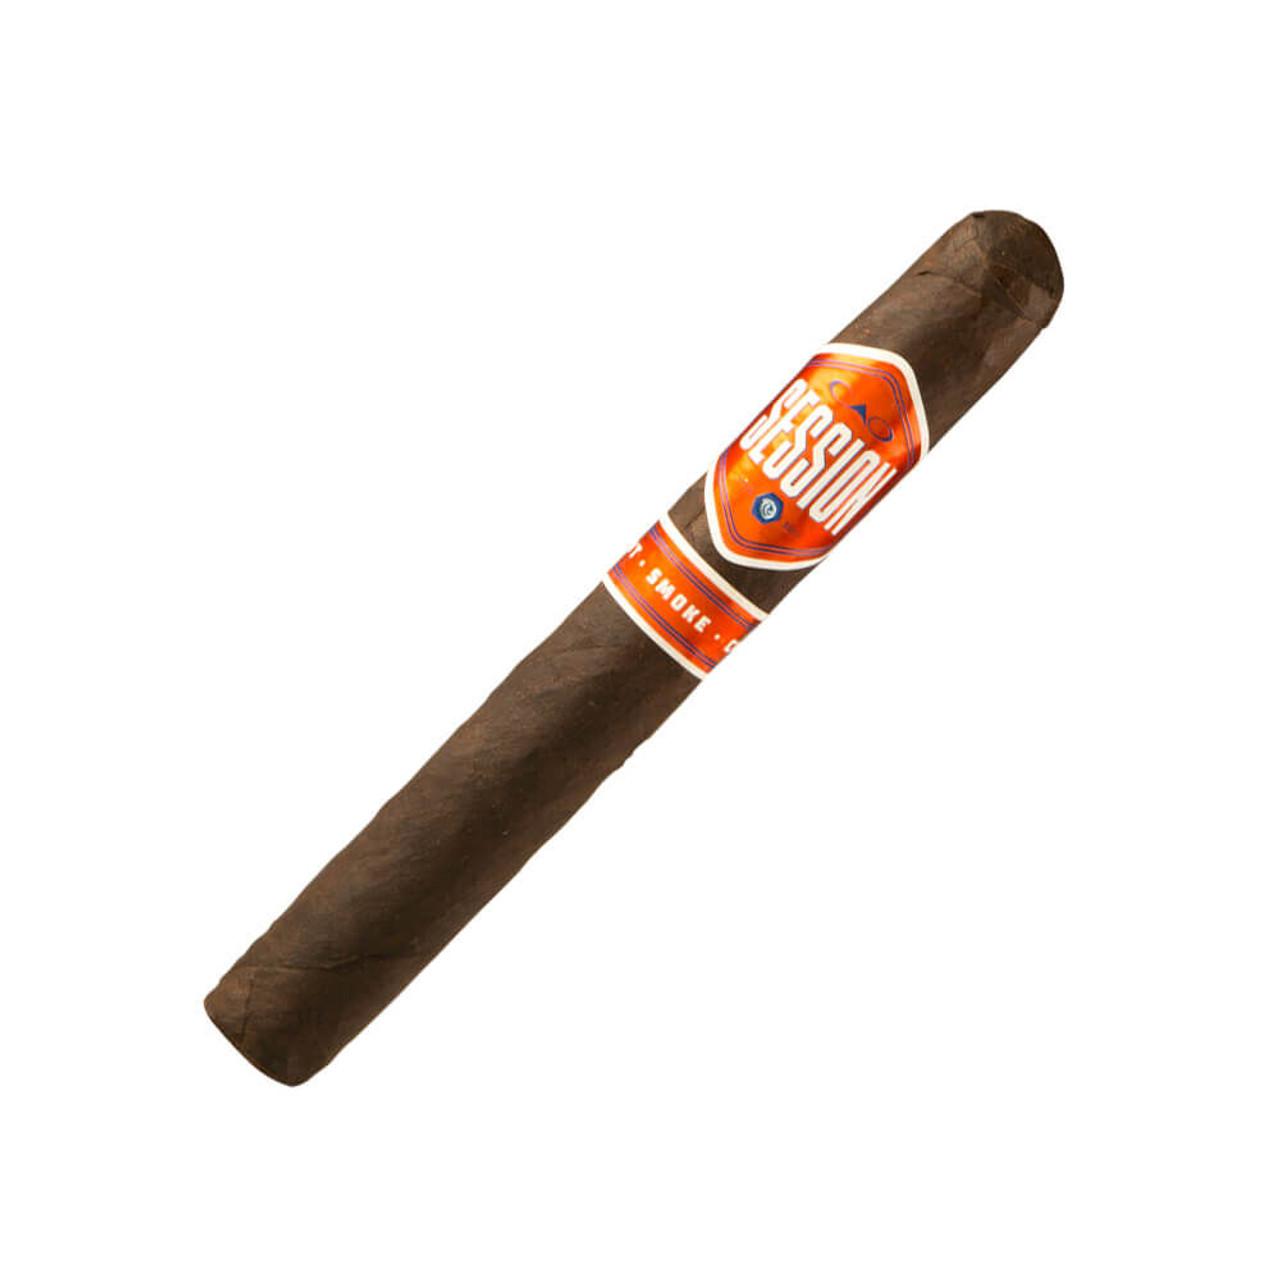 CAO Session Bar Cigars - 6.0 x 49 (Box of 20)